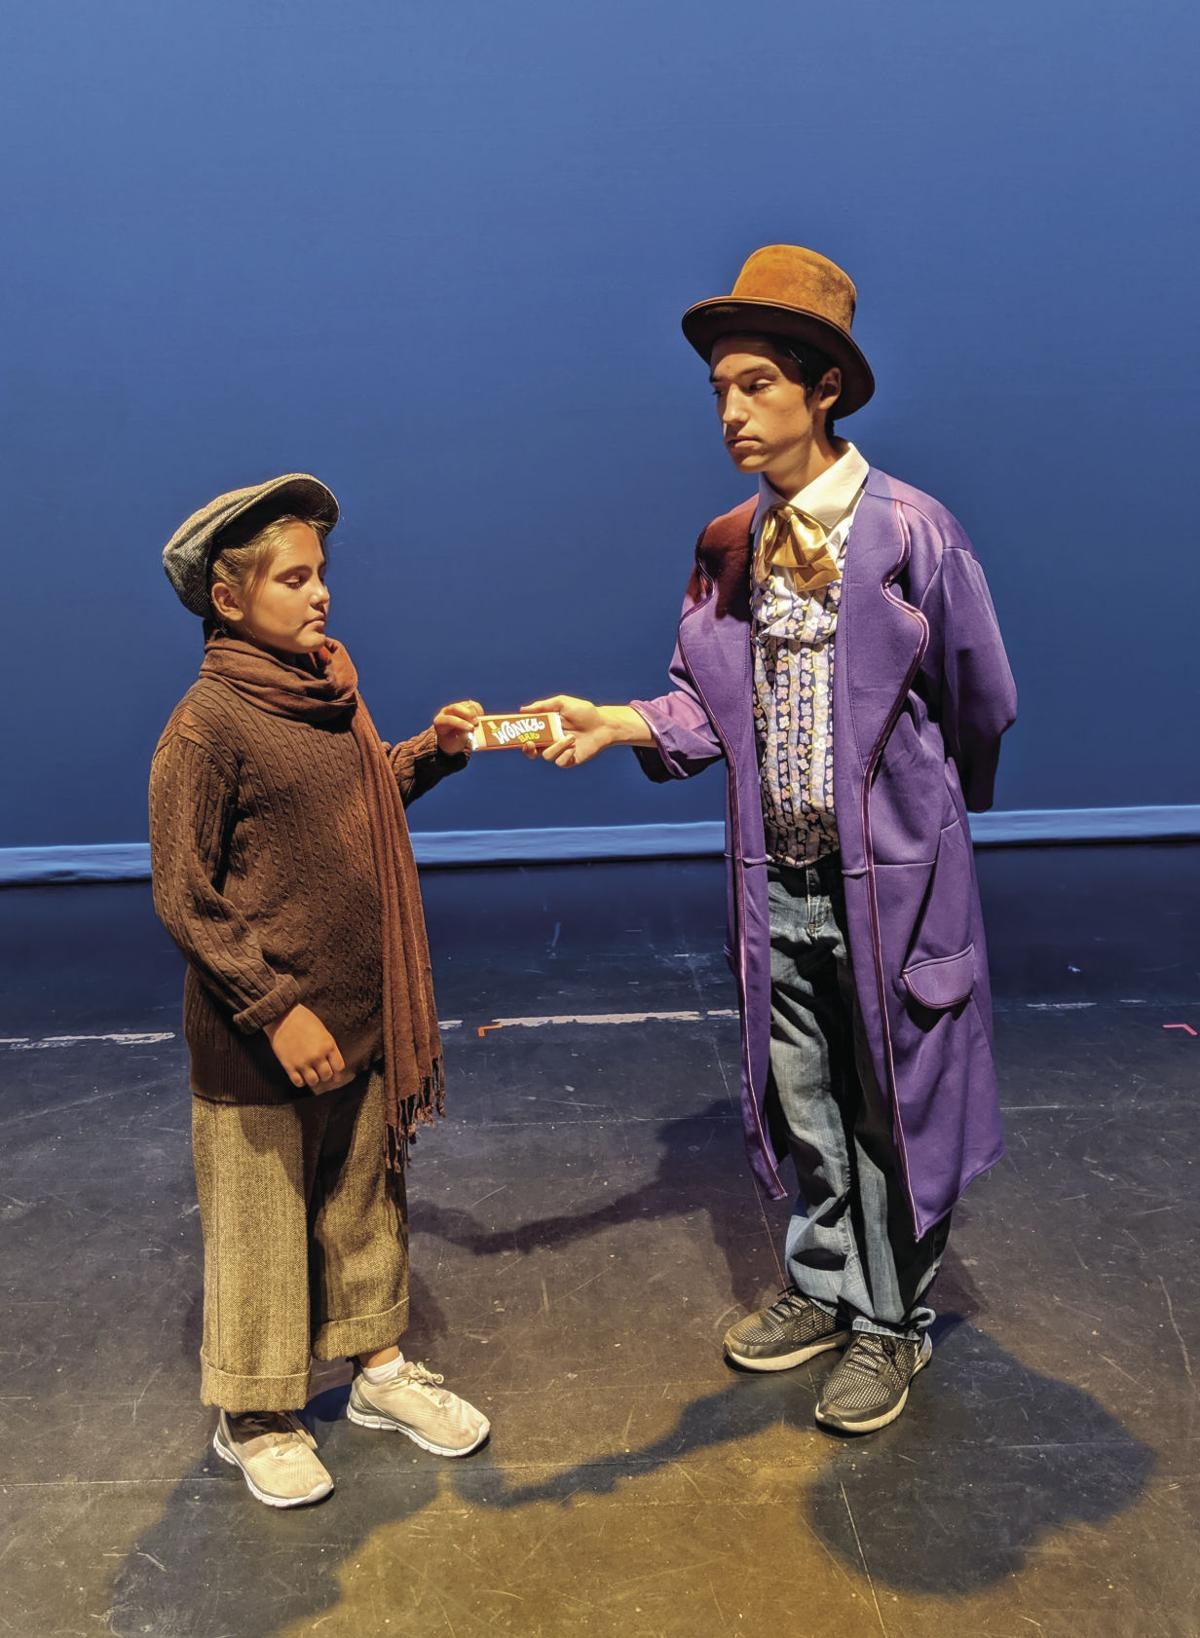 Willy Wonka Jr. 2